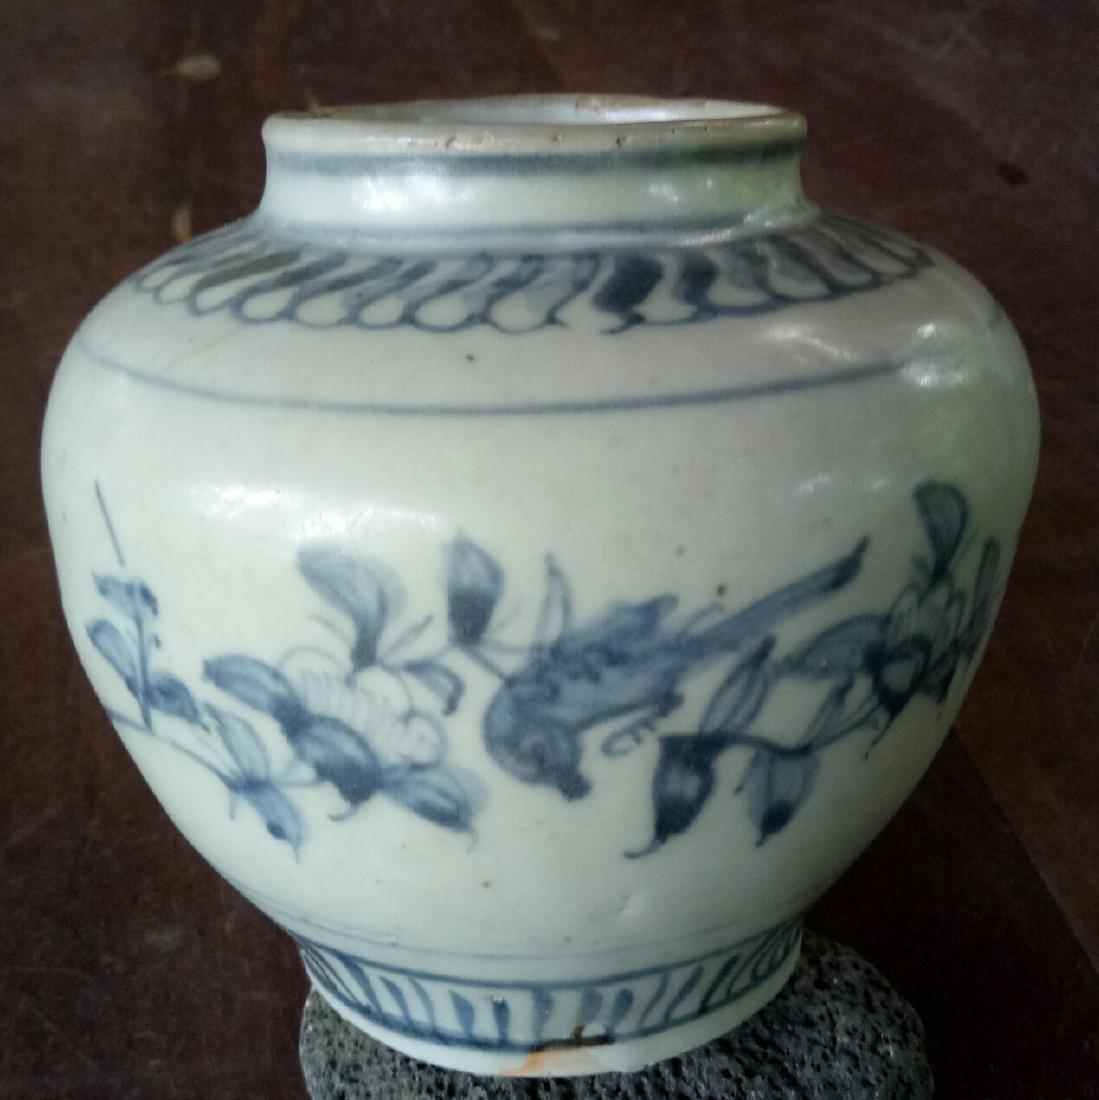 Chinese Porcelain Vase From Jiajing Period